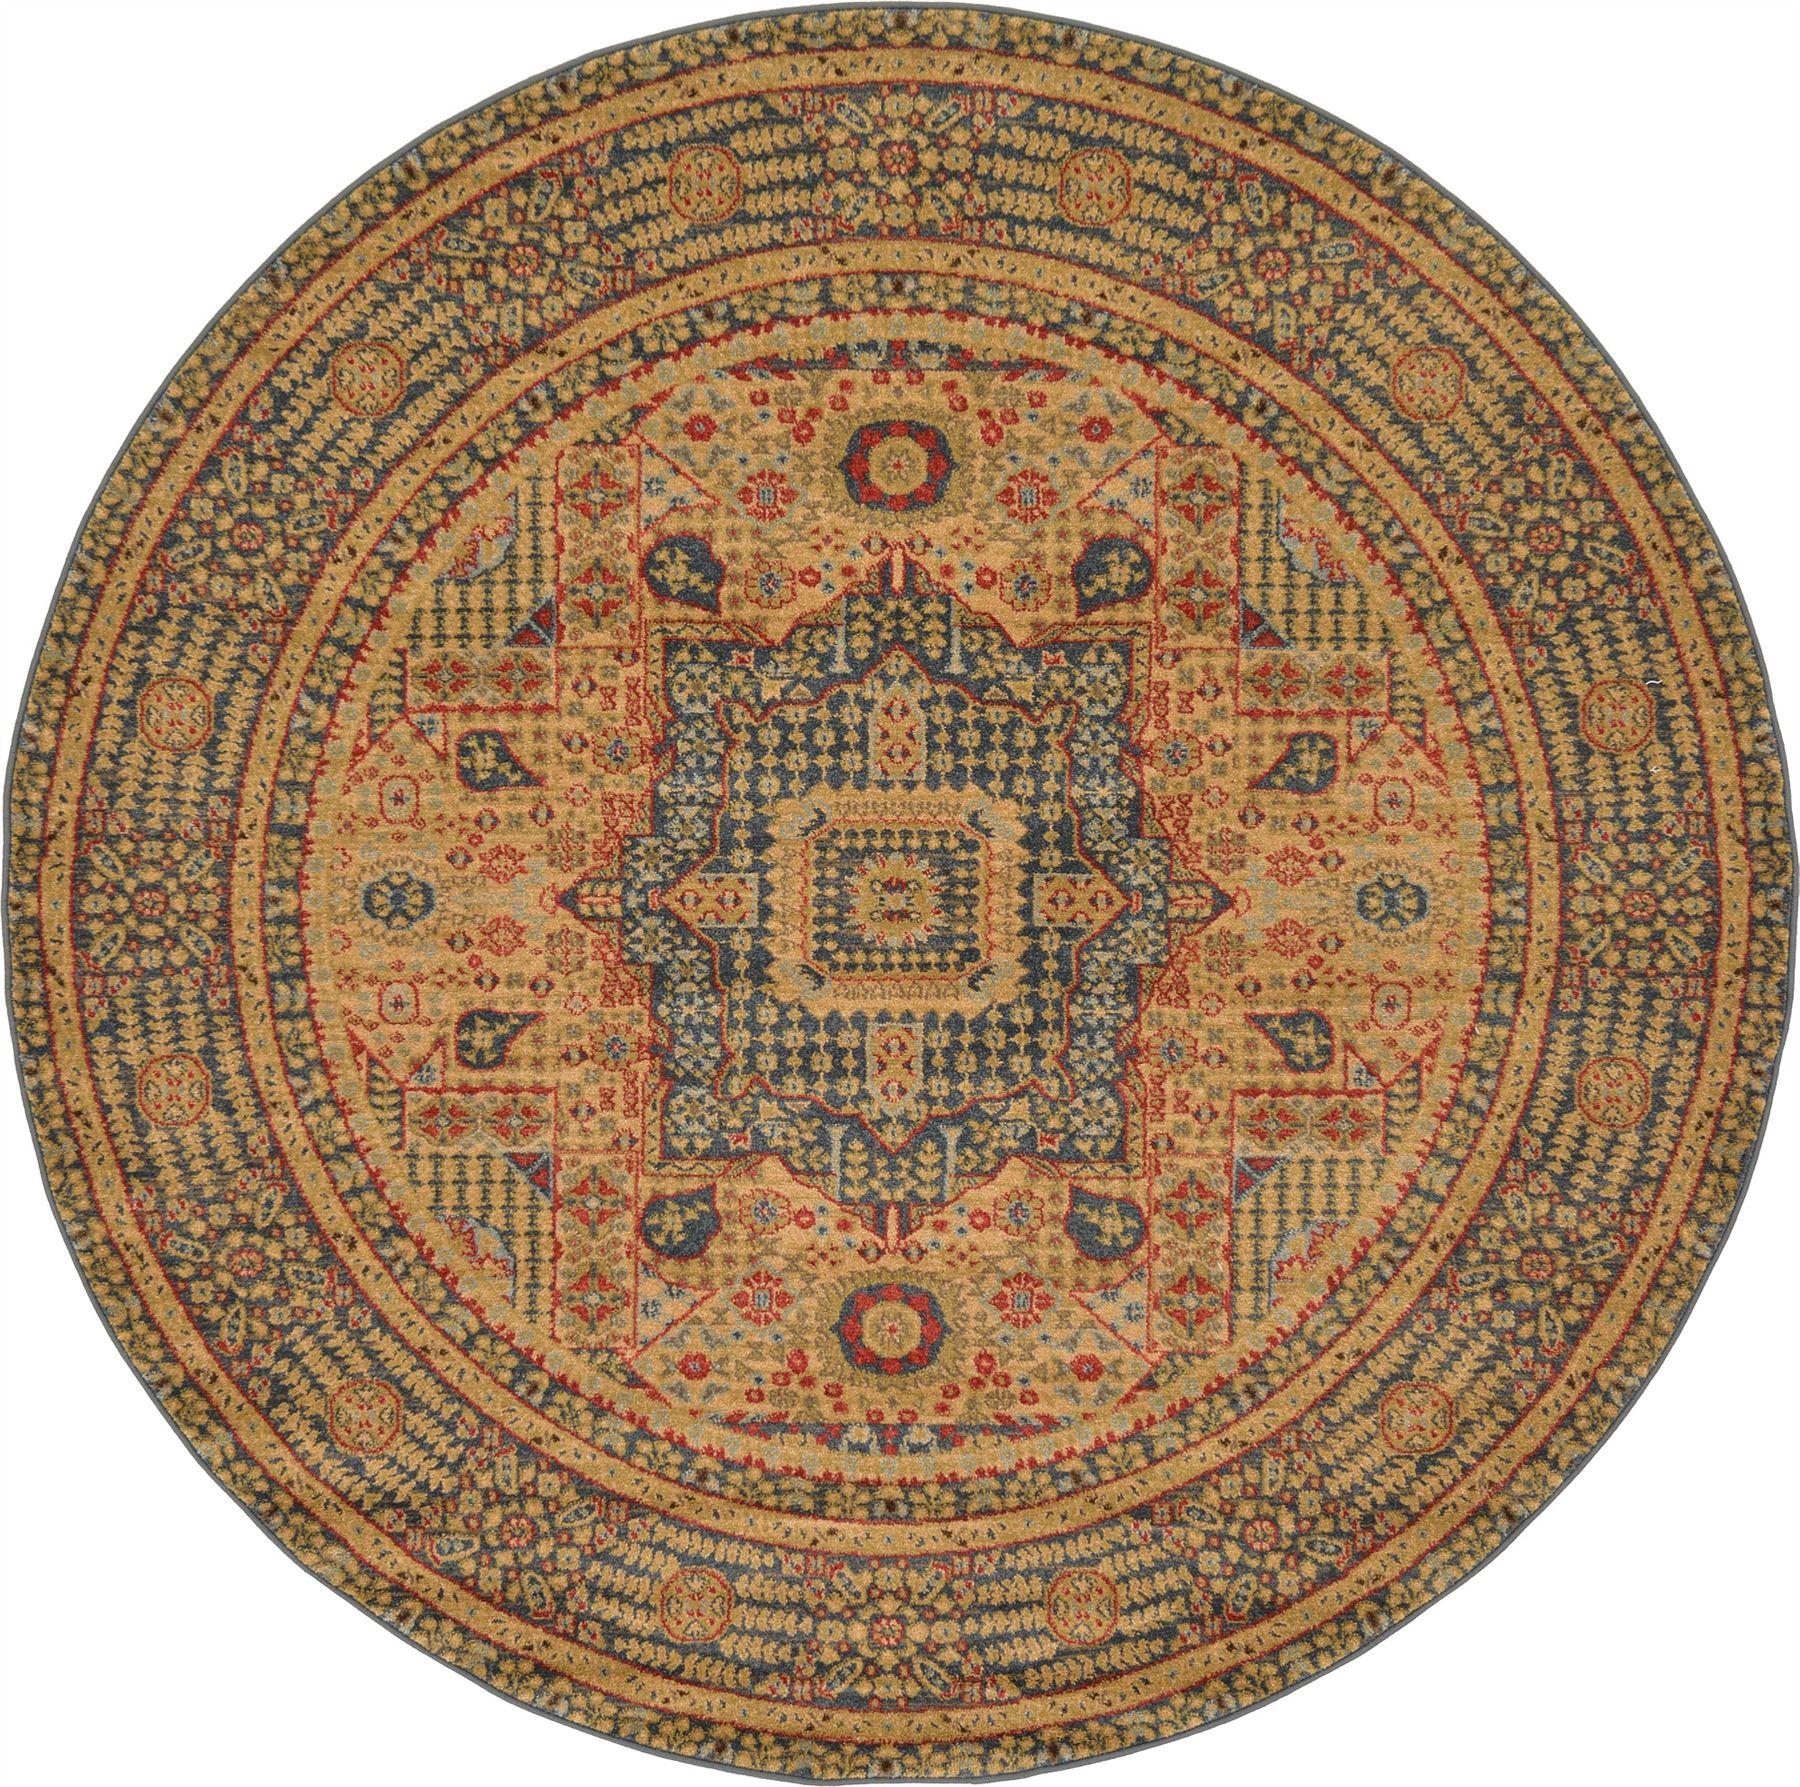 Vintage Throw Rugs: Medallion Carpet Traditional Rugs Floral Area Rug Vintage